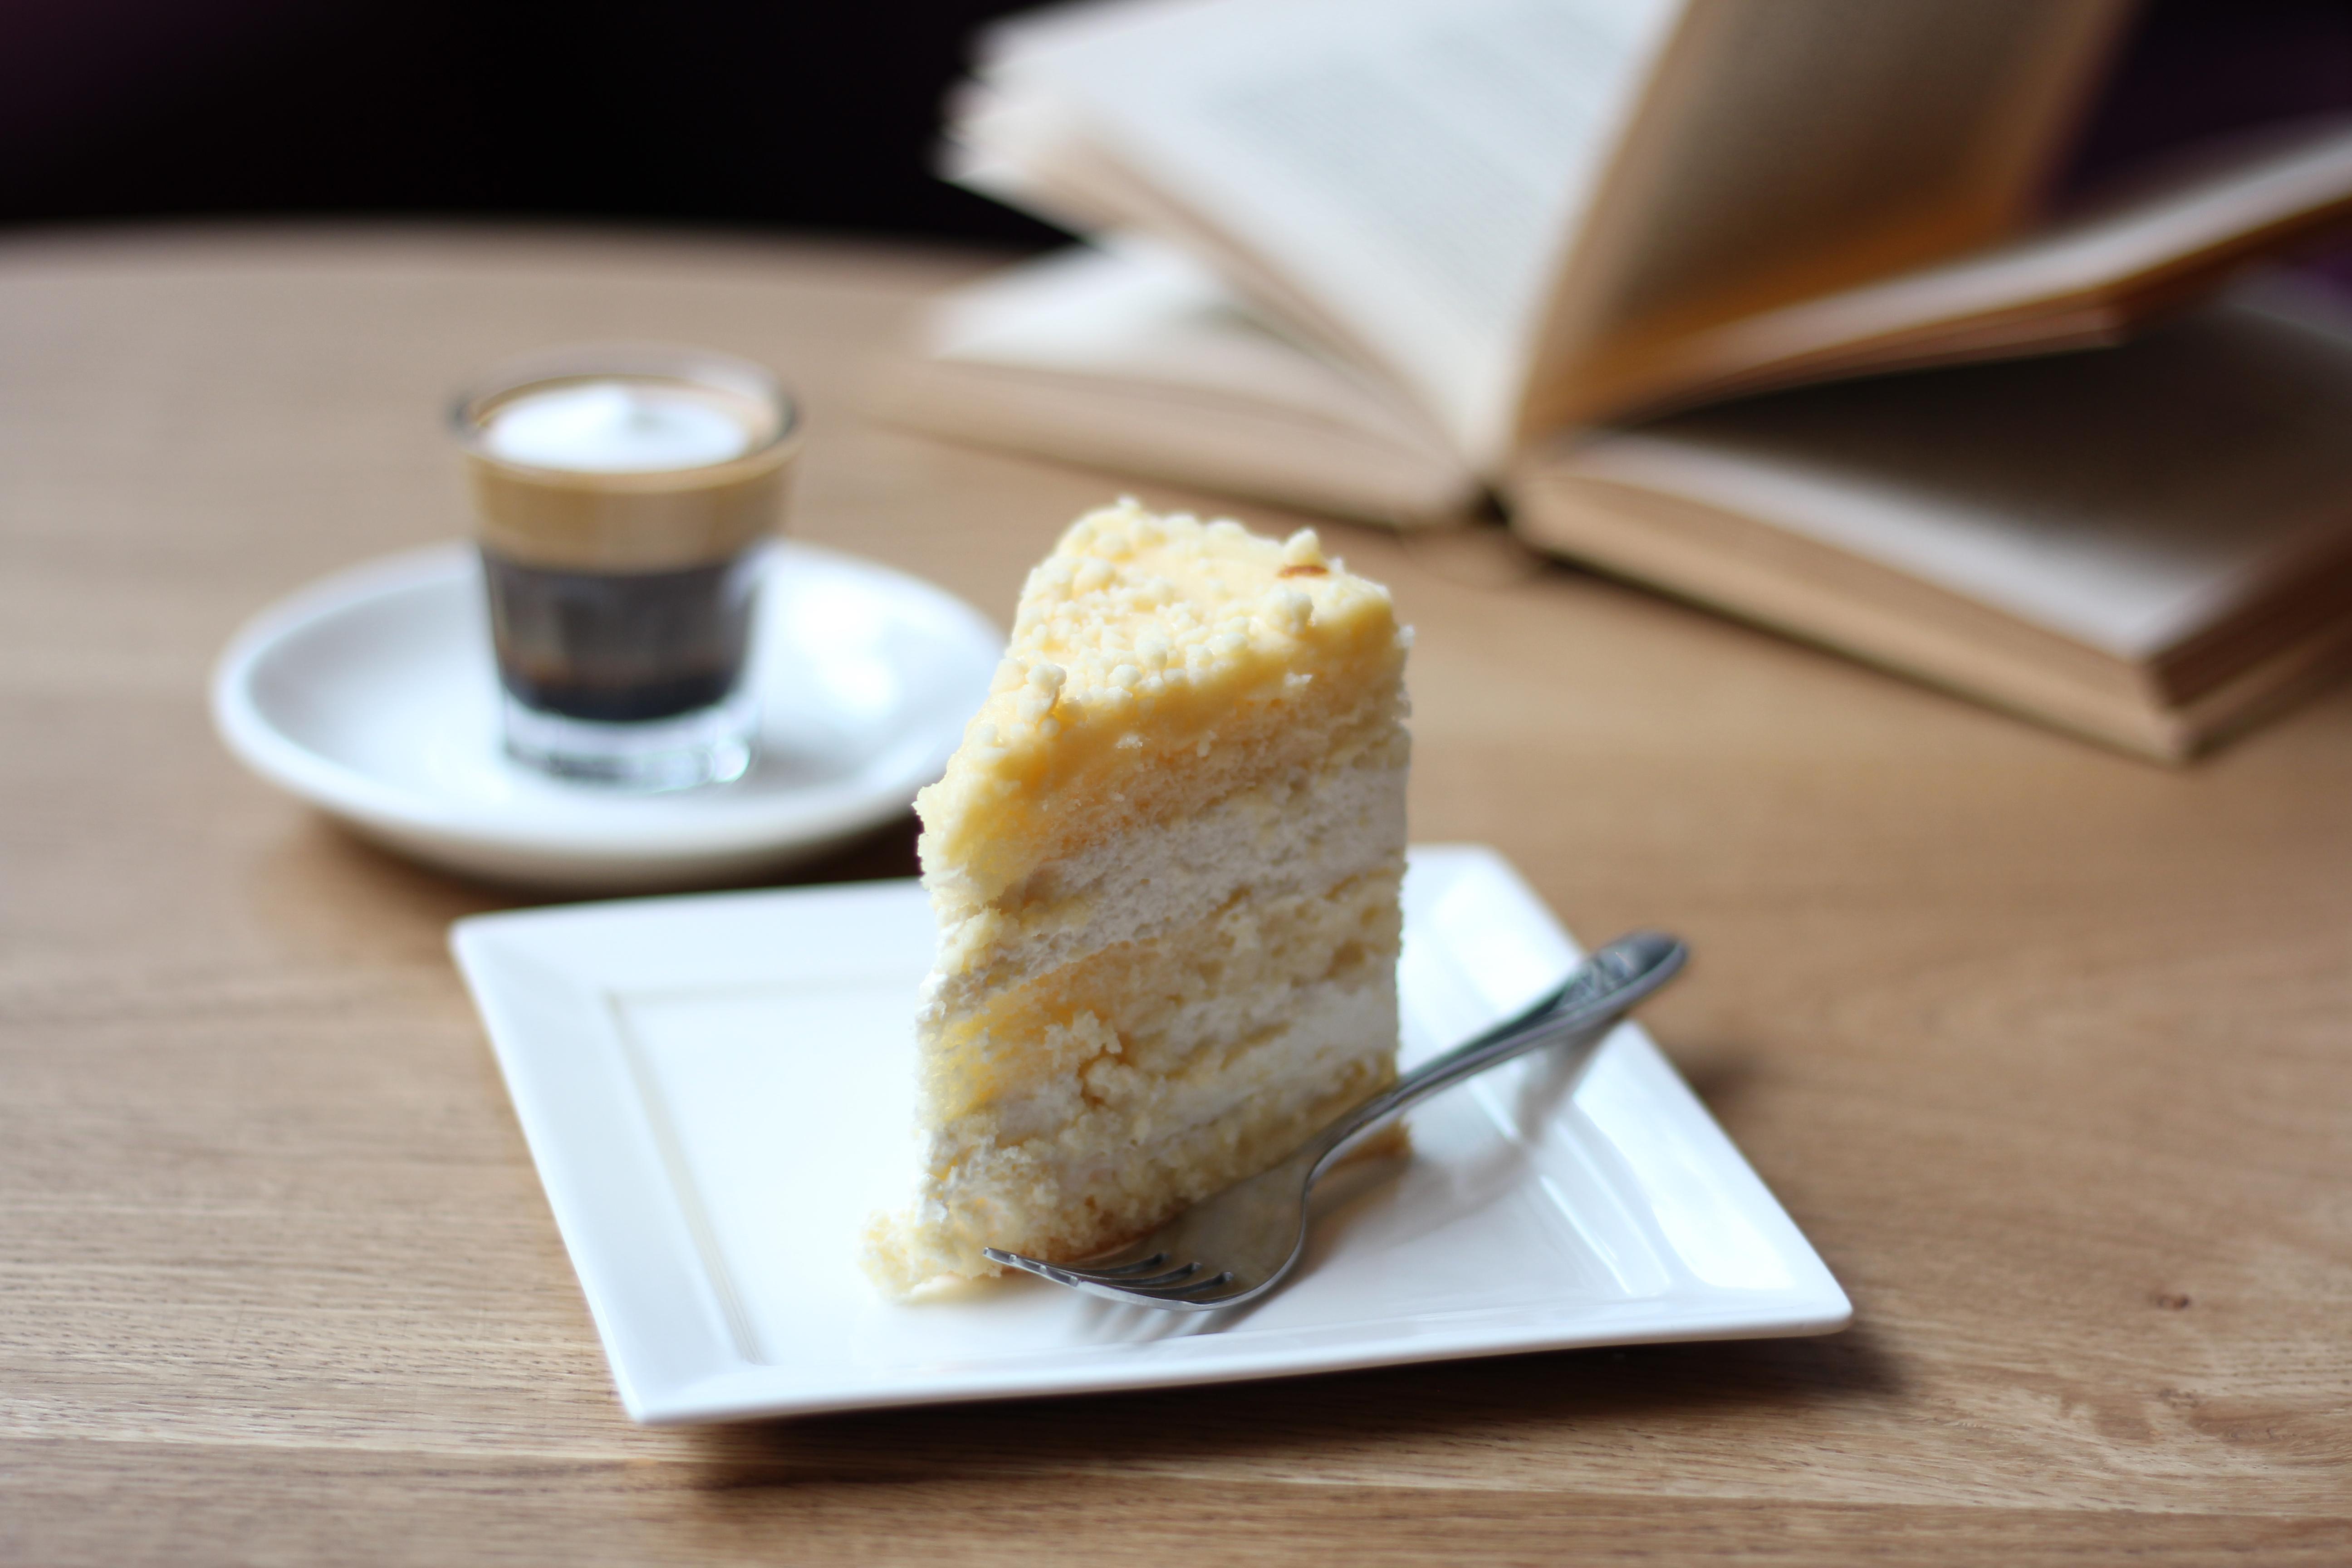 scrumptious cake